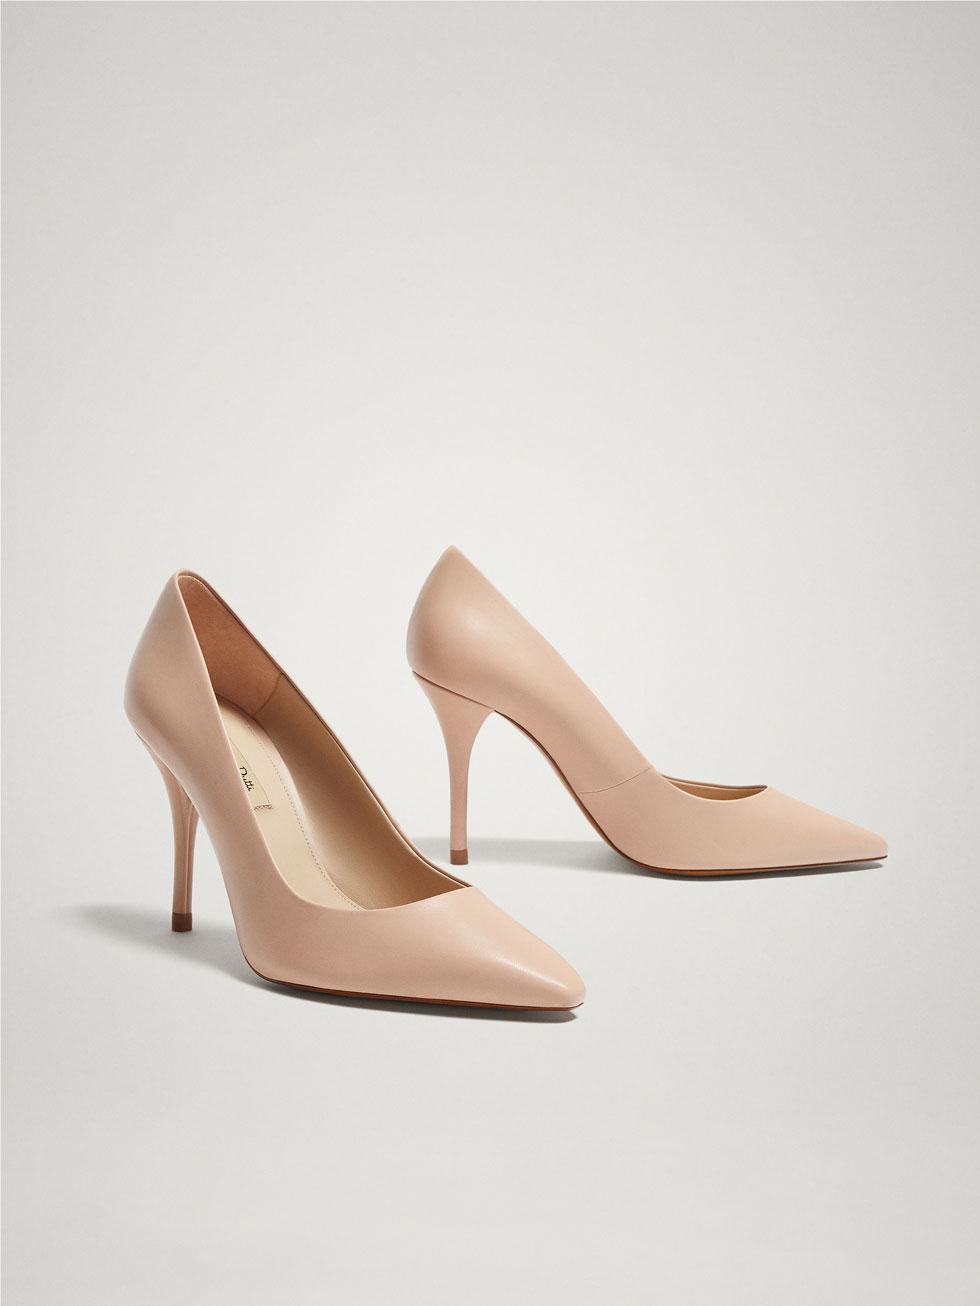 pantofii nude stiletto